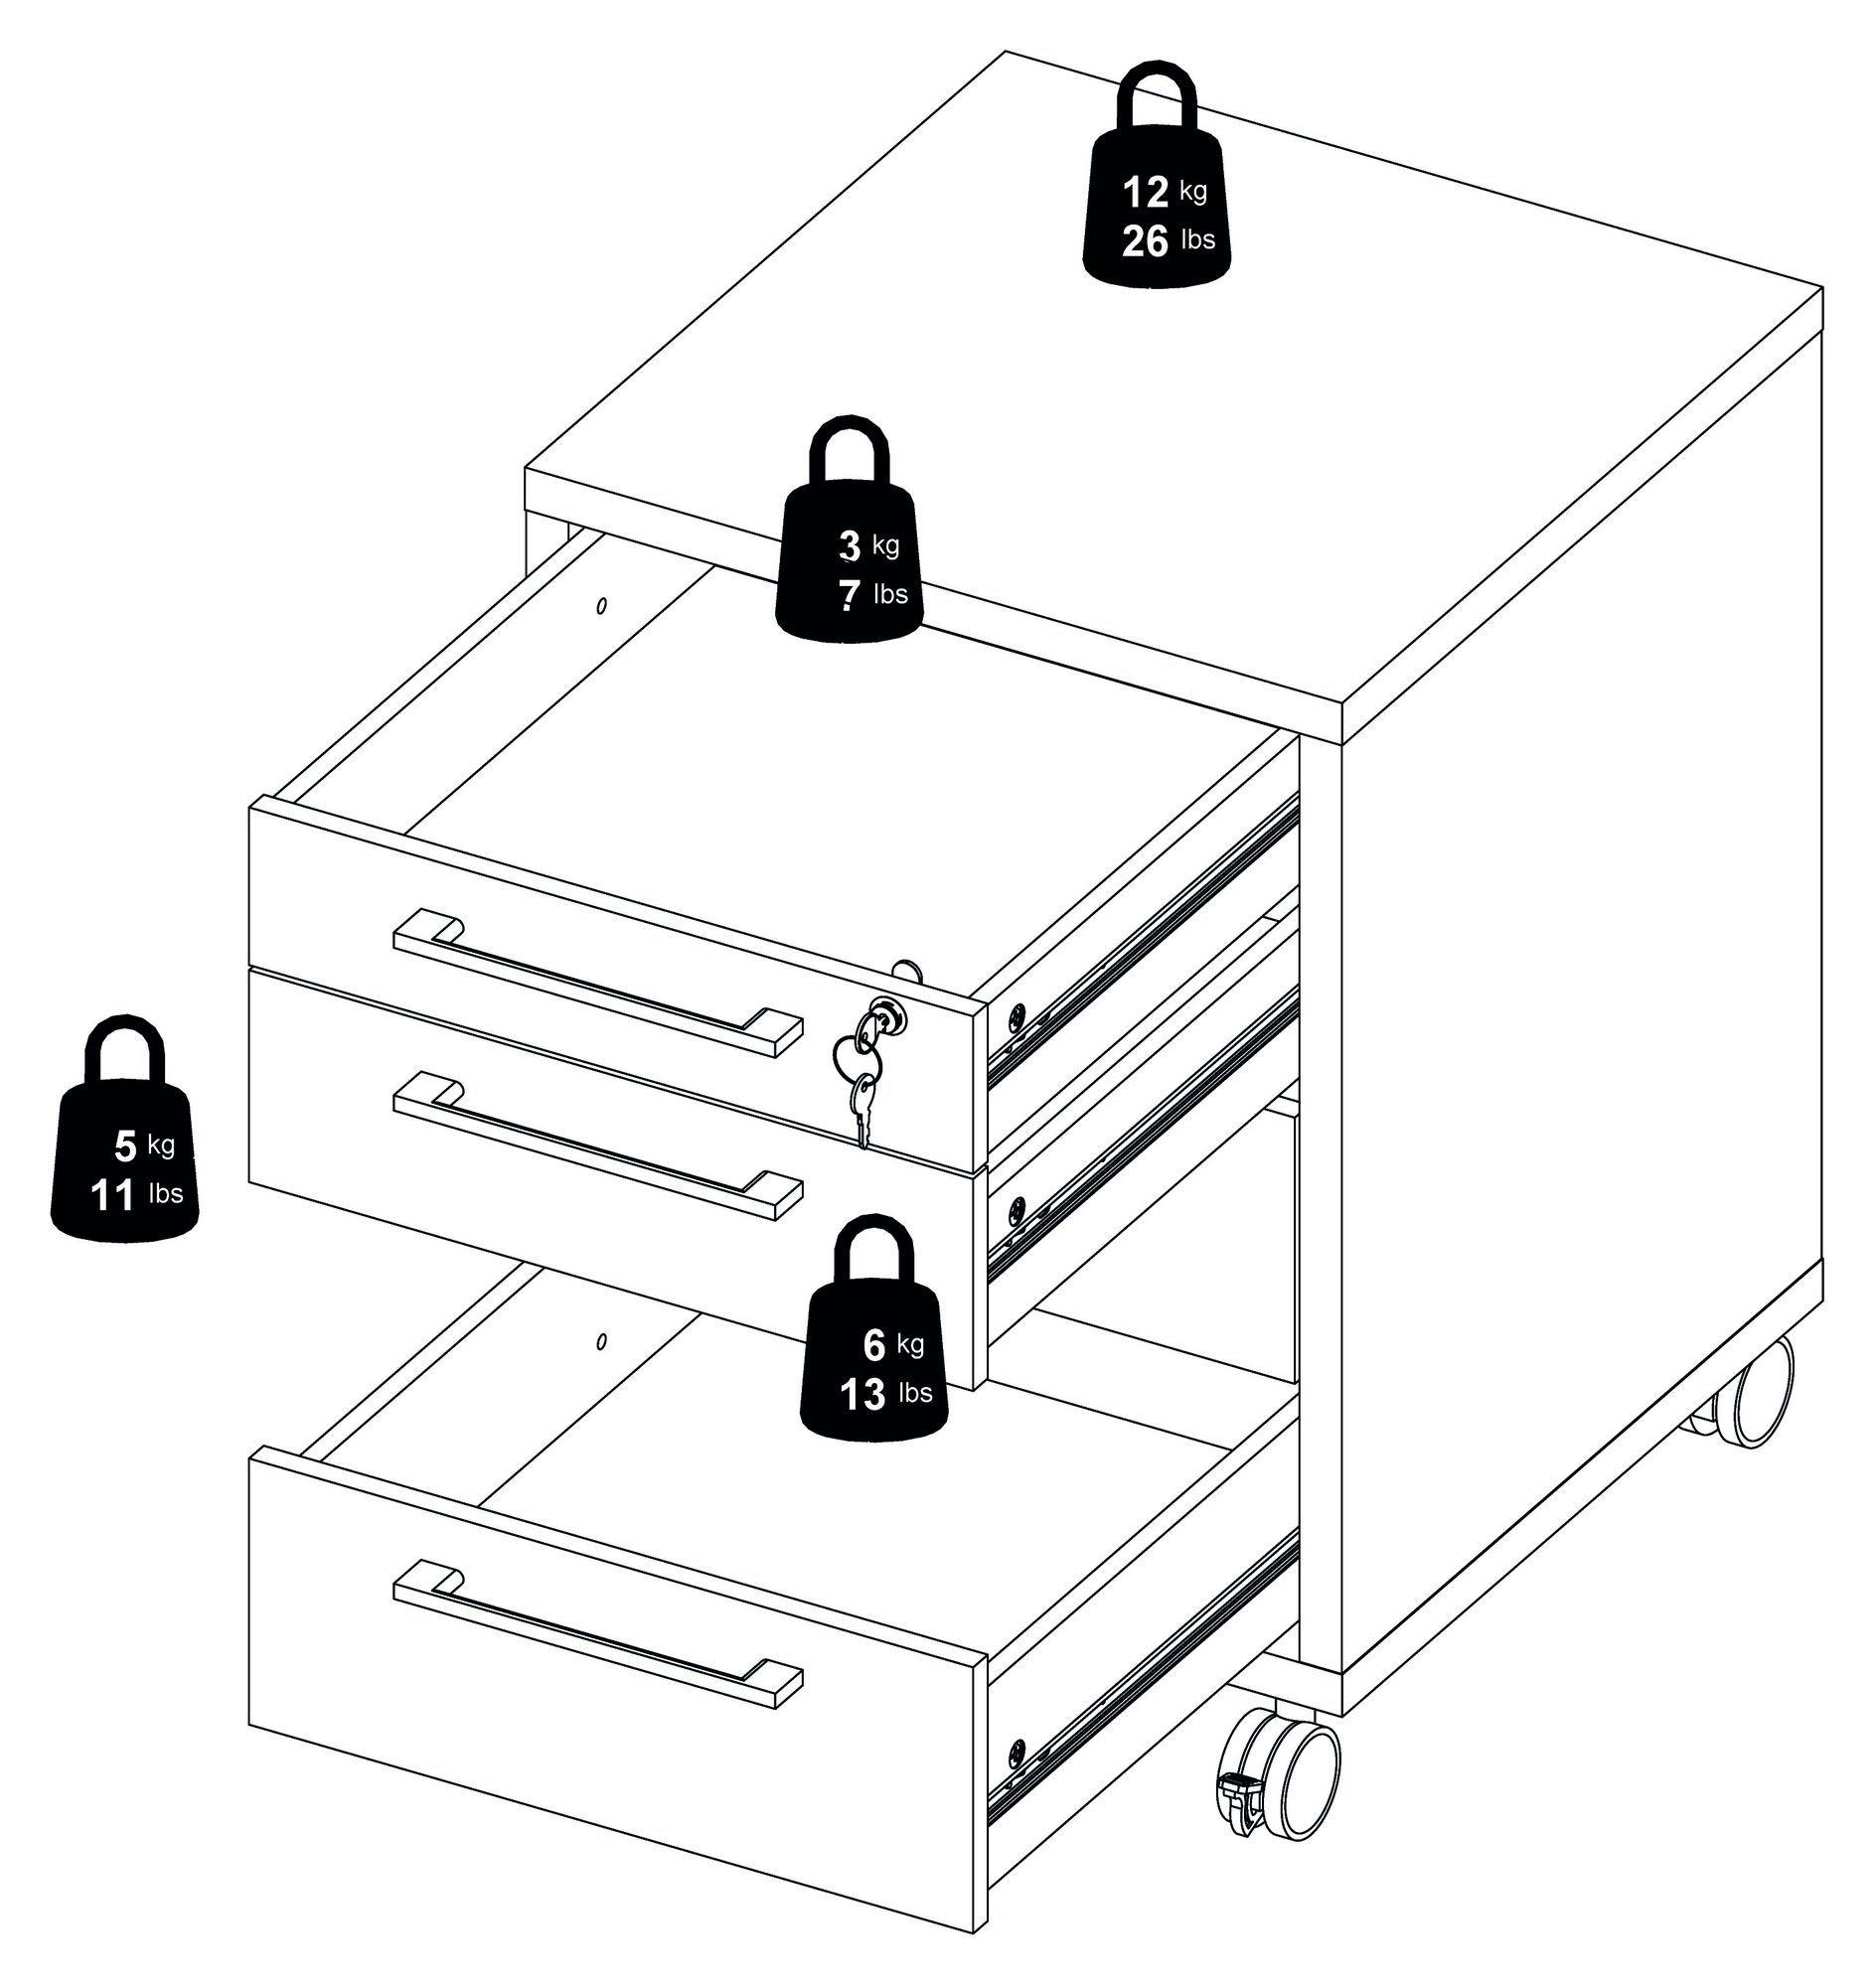 Prima Skuffemodul - Sort m/4 skuffer - Skuffemodul i sort